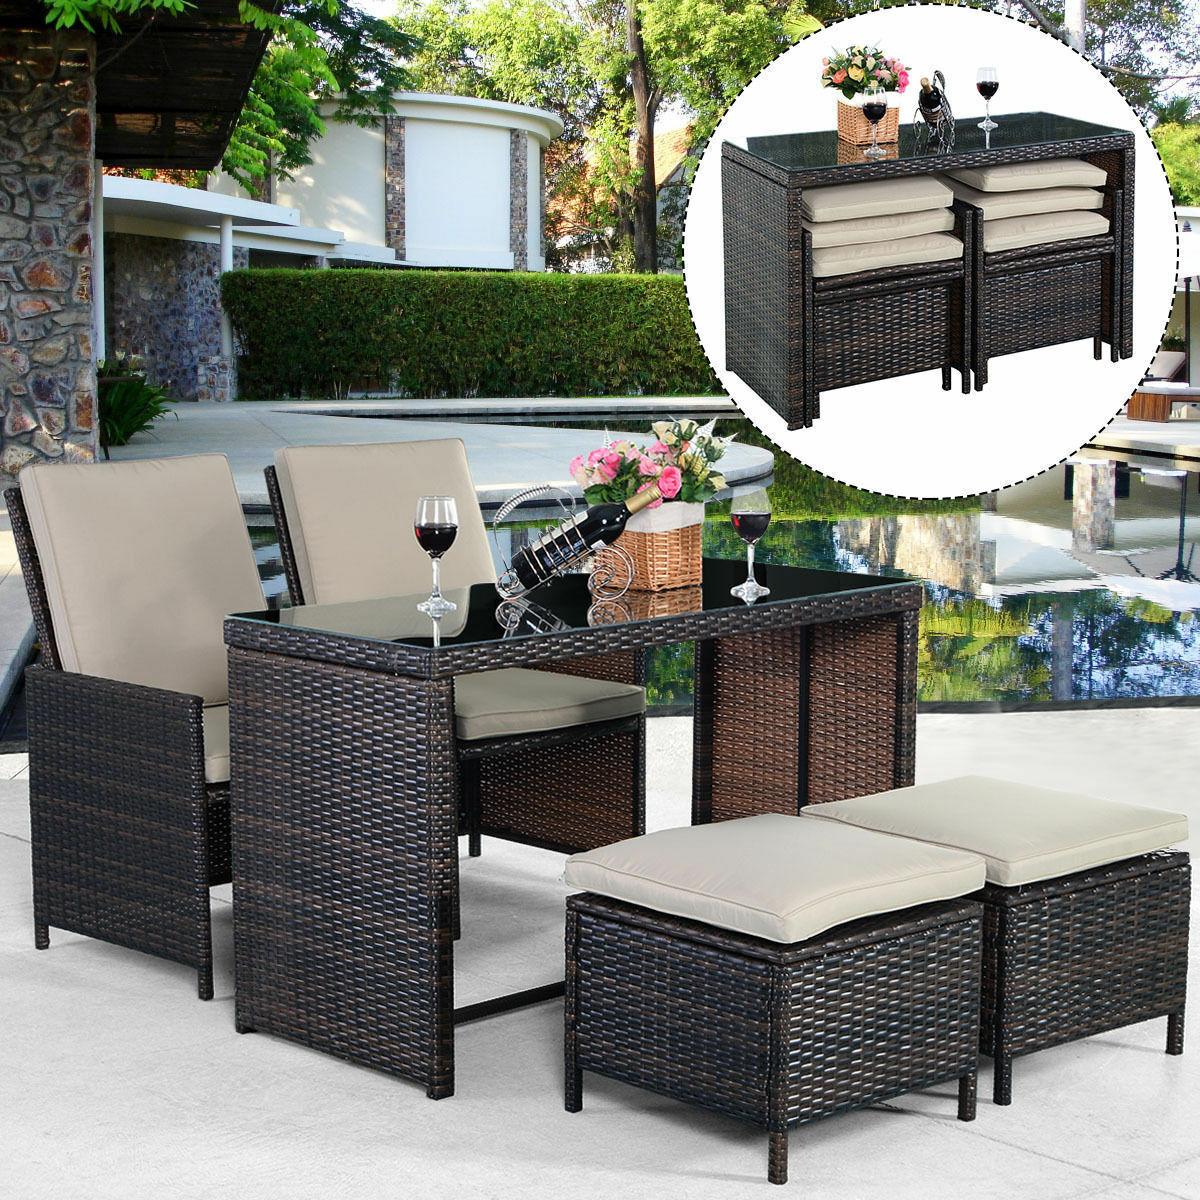 Garden Furniture - New 5PCS Brown Cushioned Ottoman Rattan Patio Set Outdoor Furniture Garden